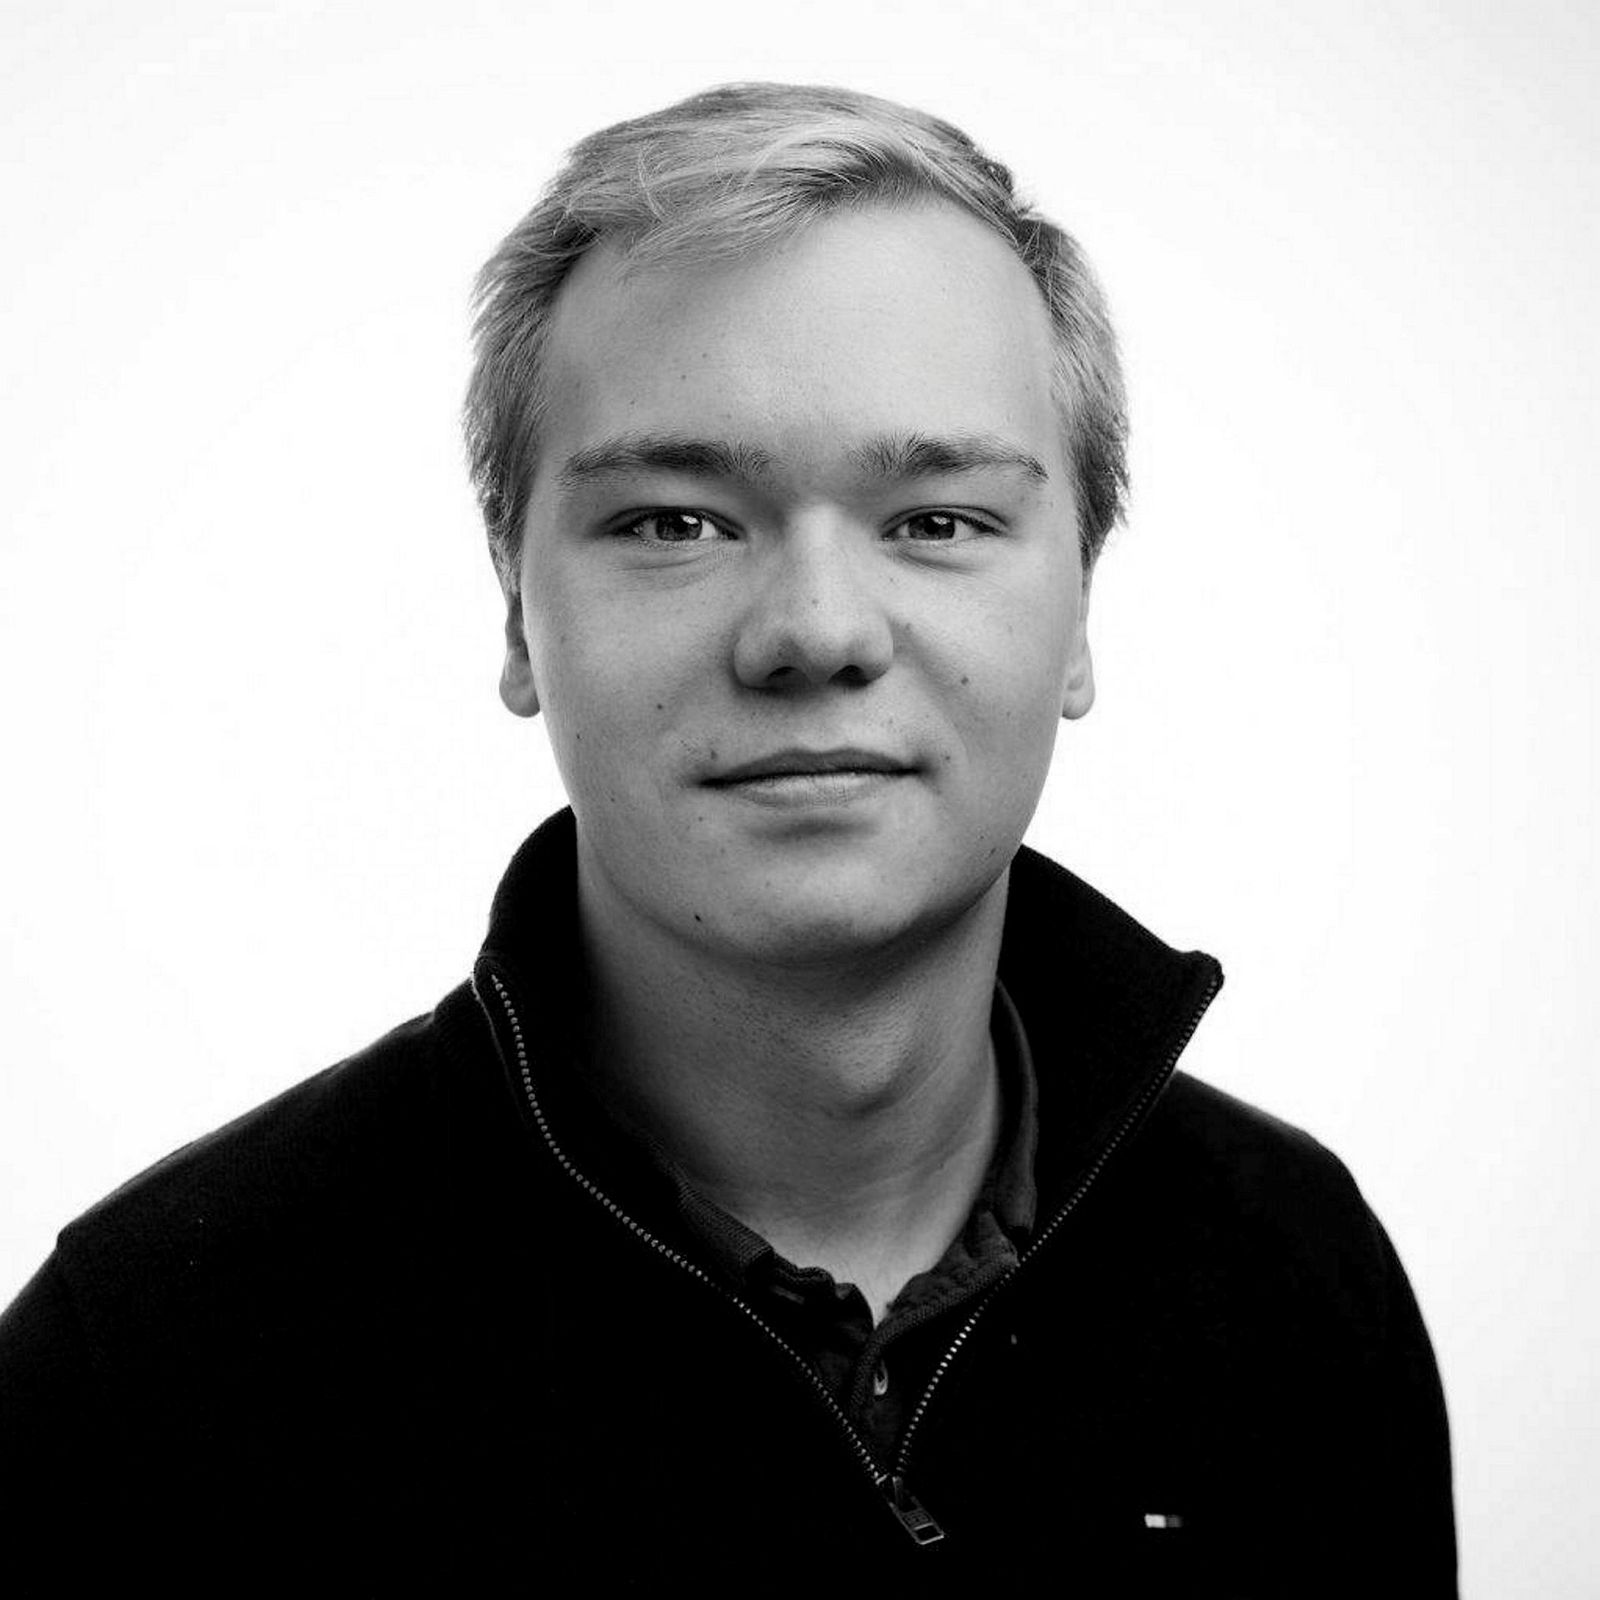 Eirik Helgaker